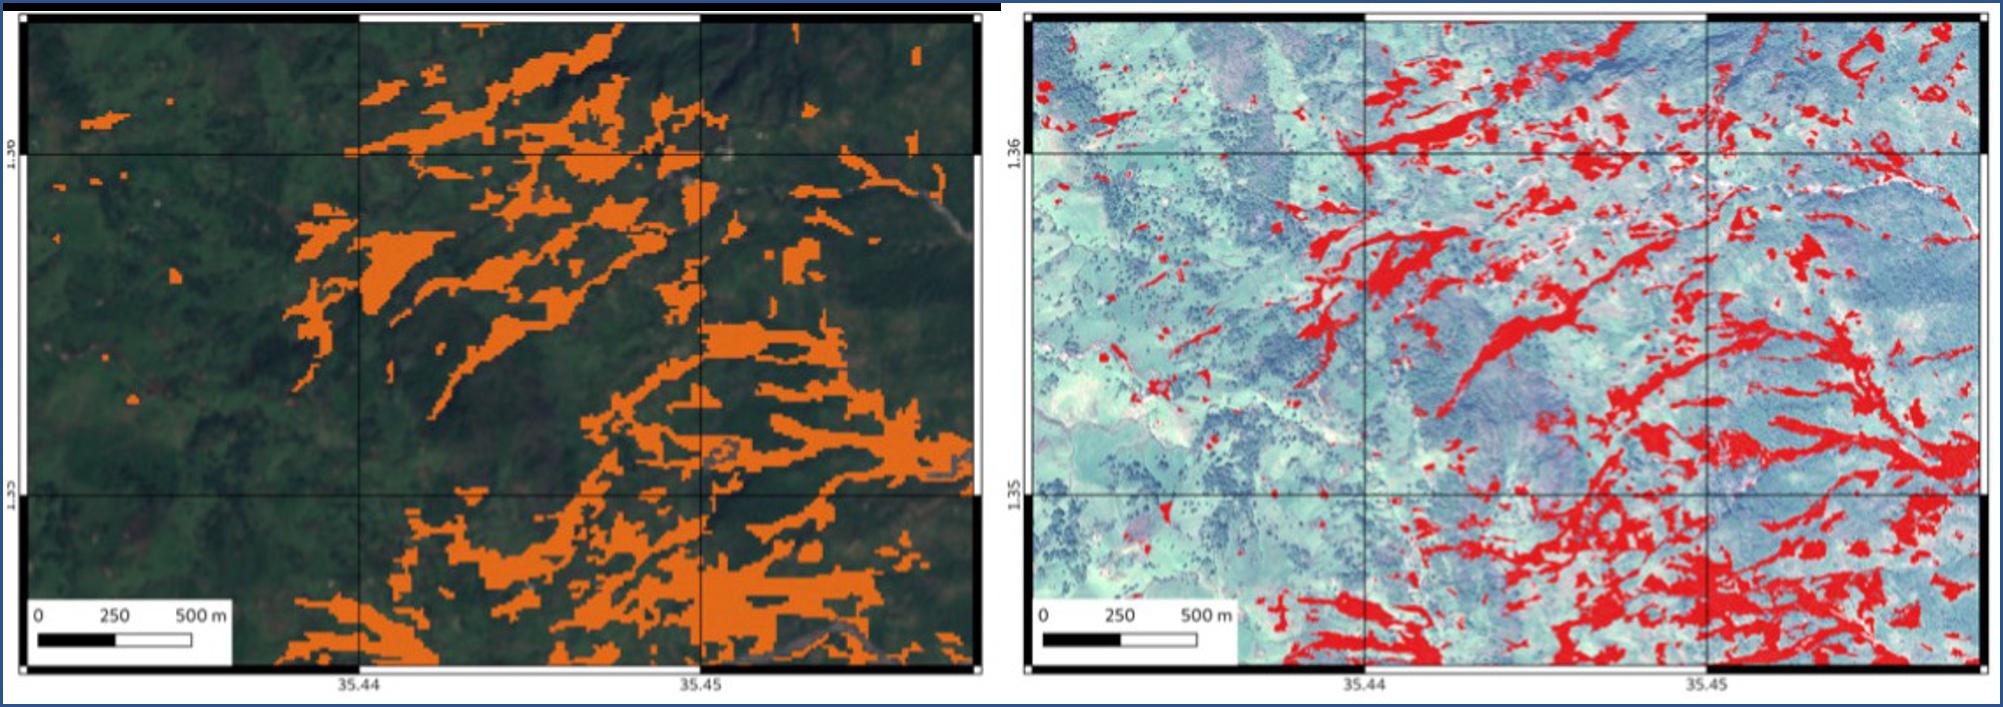 Glissements de terrain au Kenya – Novembre 2019 UNISTRA- EOST (en partenariat avec UNOSAT)